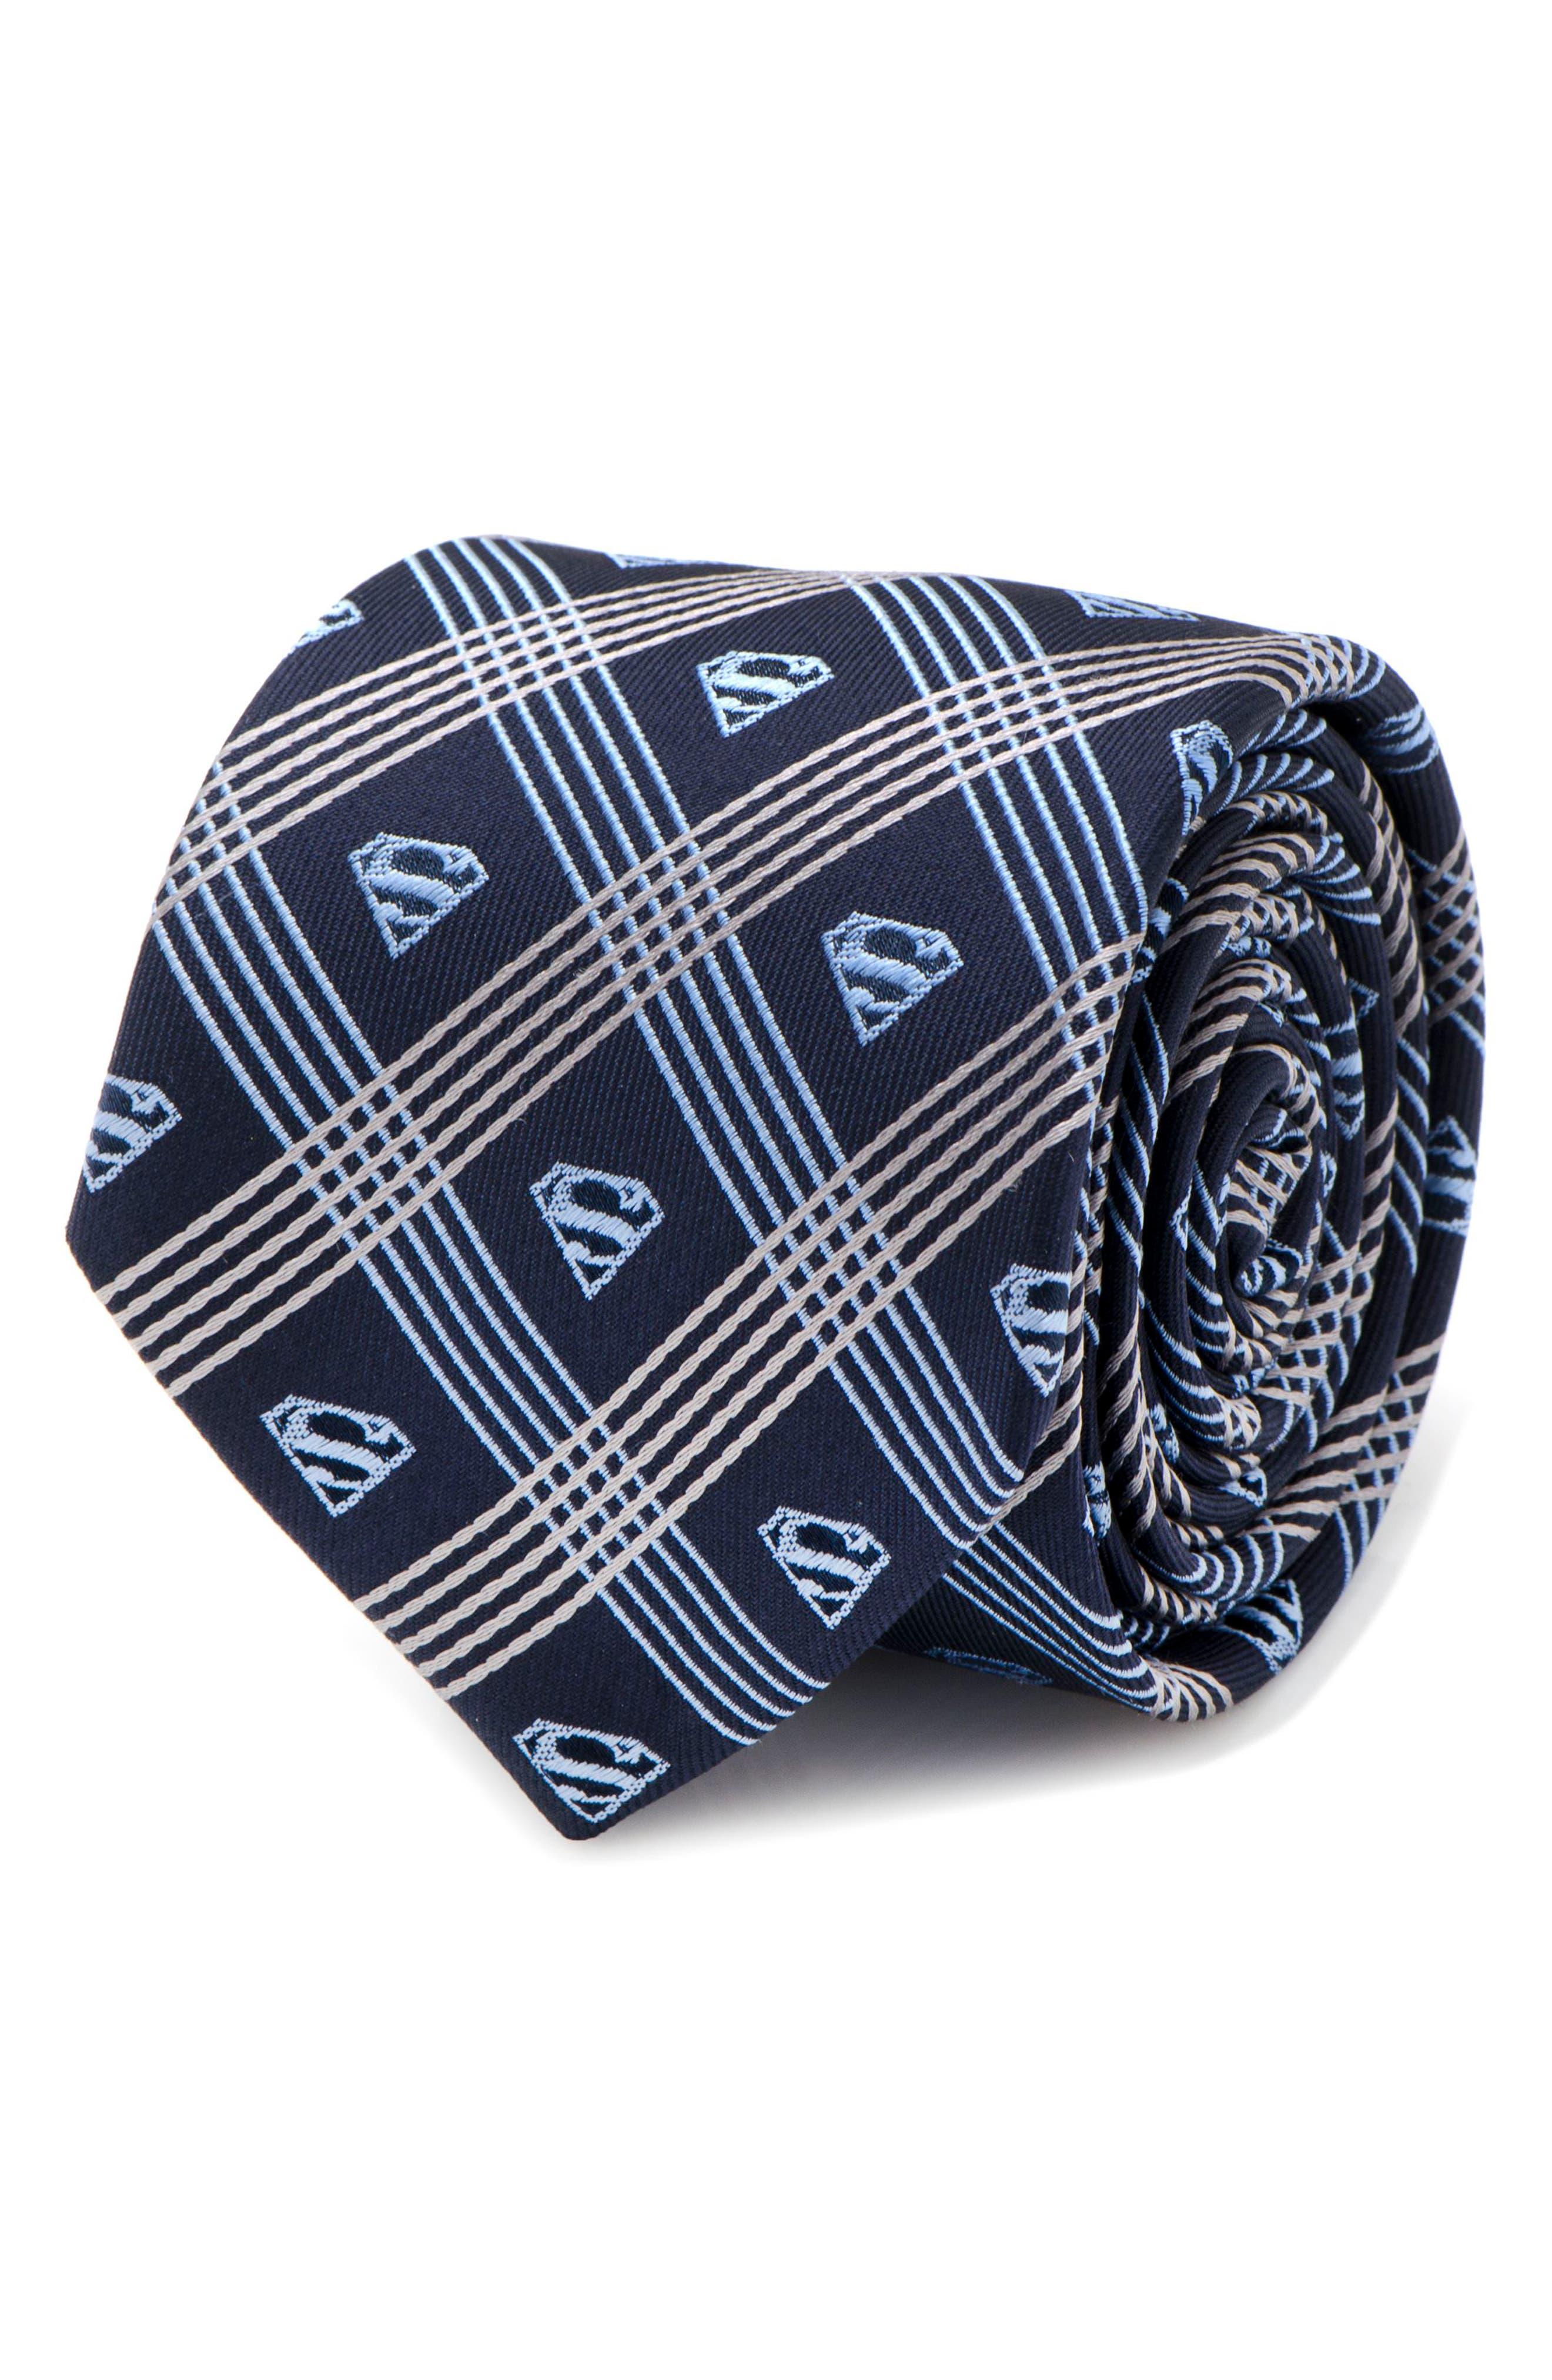 Superman Shield Silk Tie,                             Alternate thumbnail 4, color,                             020